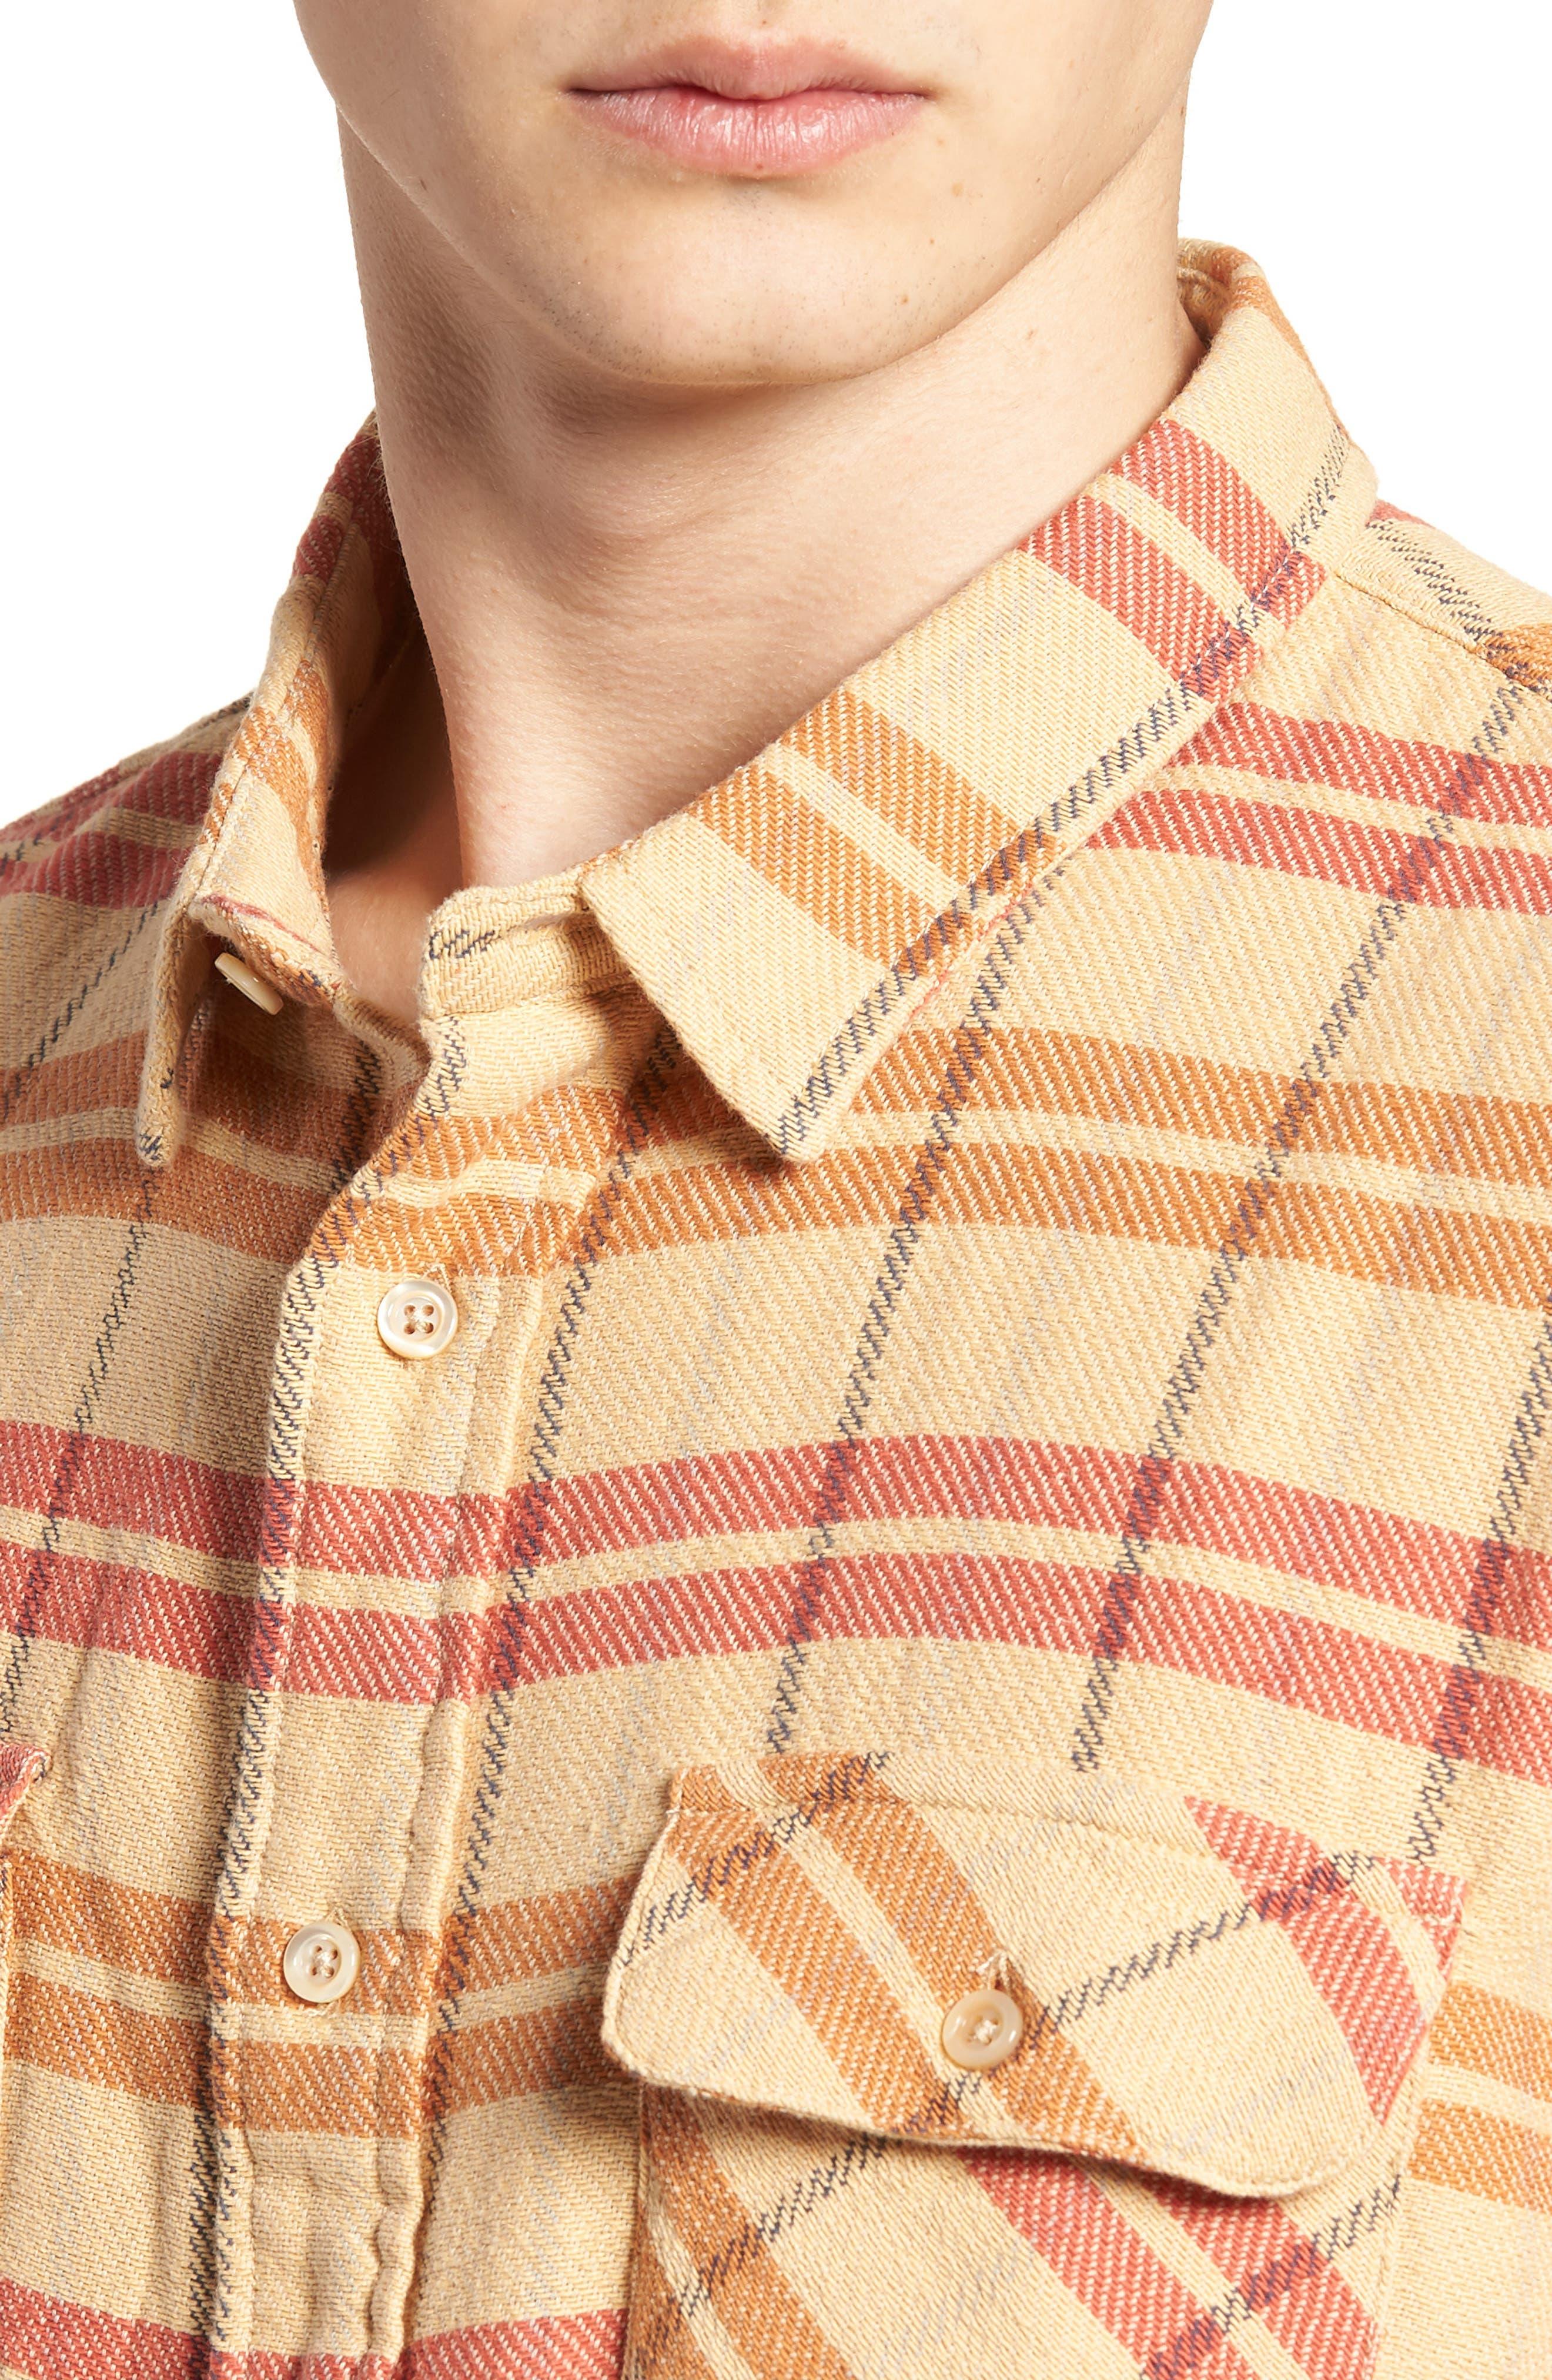 Shorthorn Western Shirt,                             Alternate thumbnail 2, color,                             Sunfaded Orange